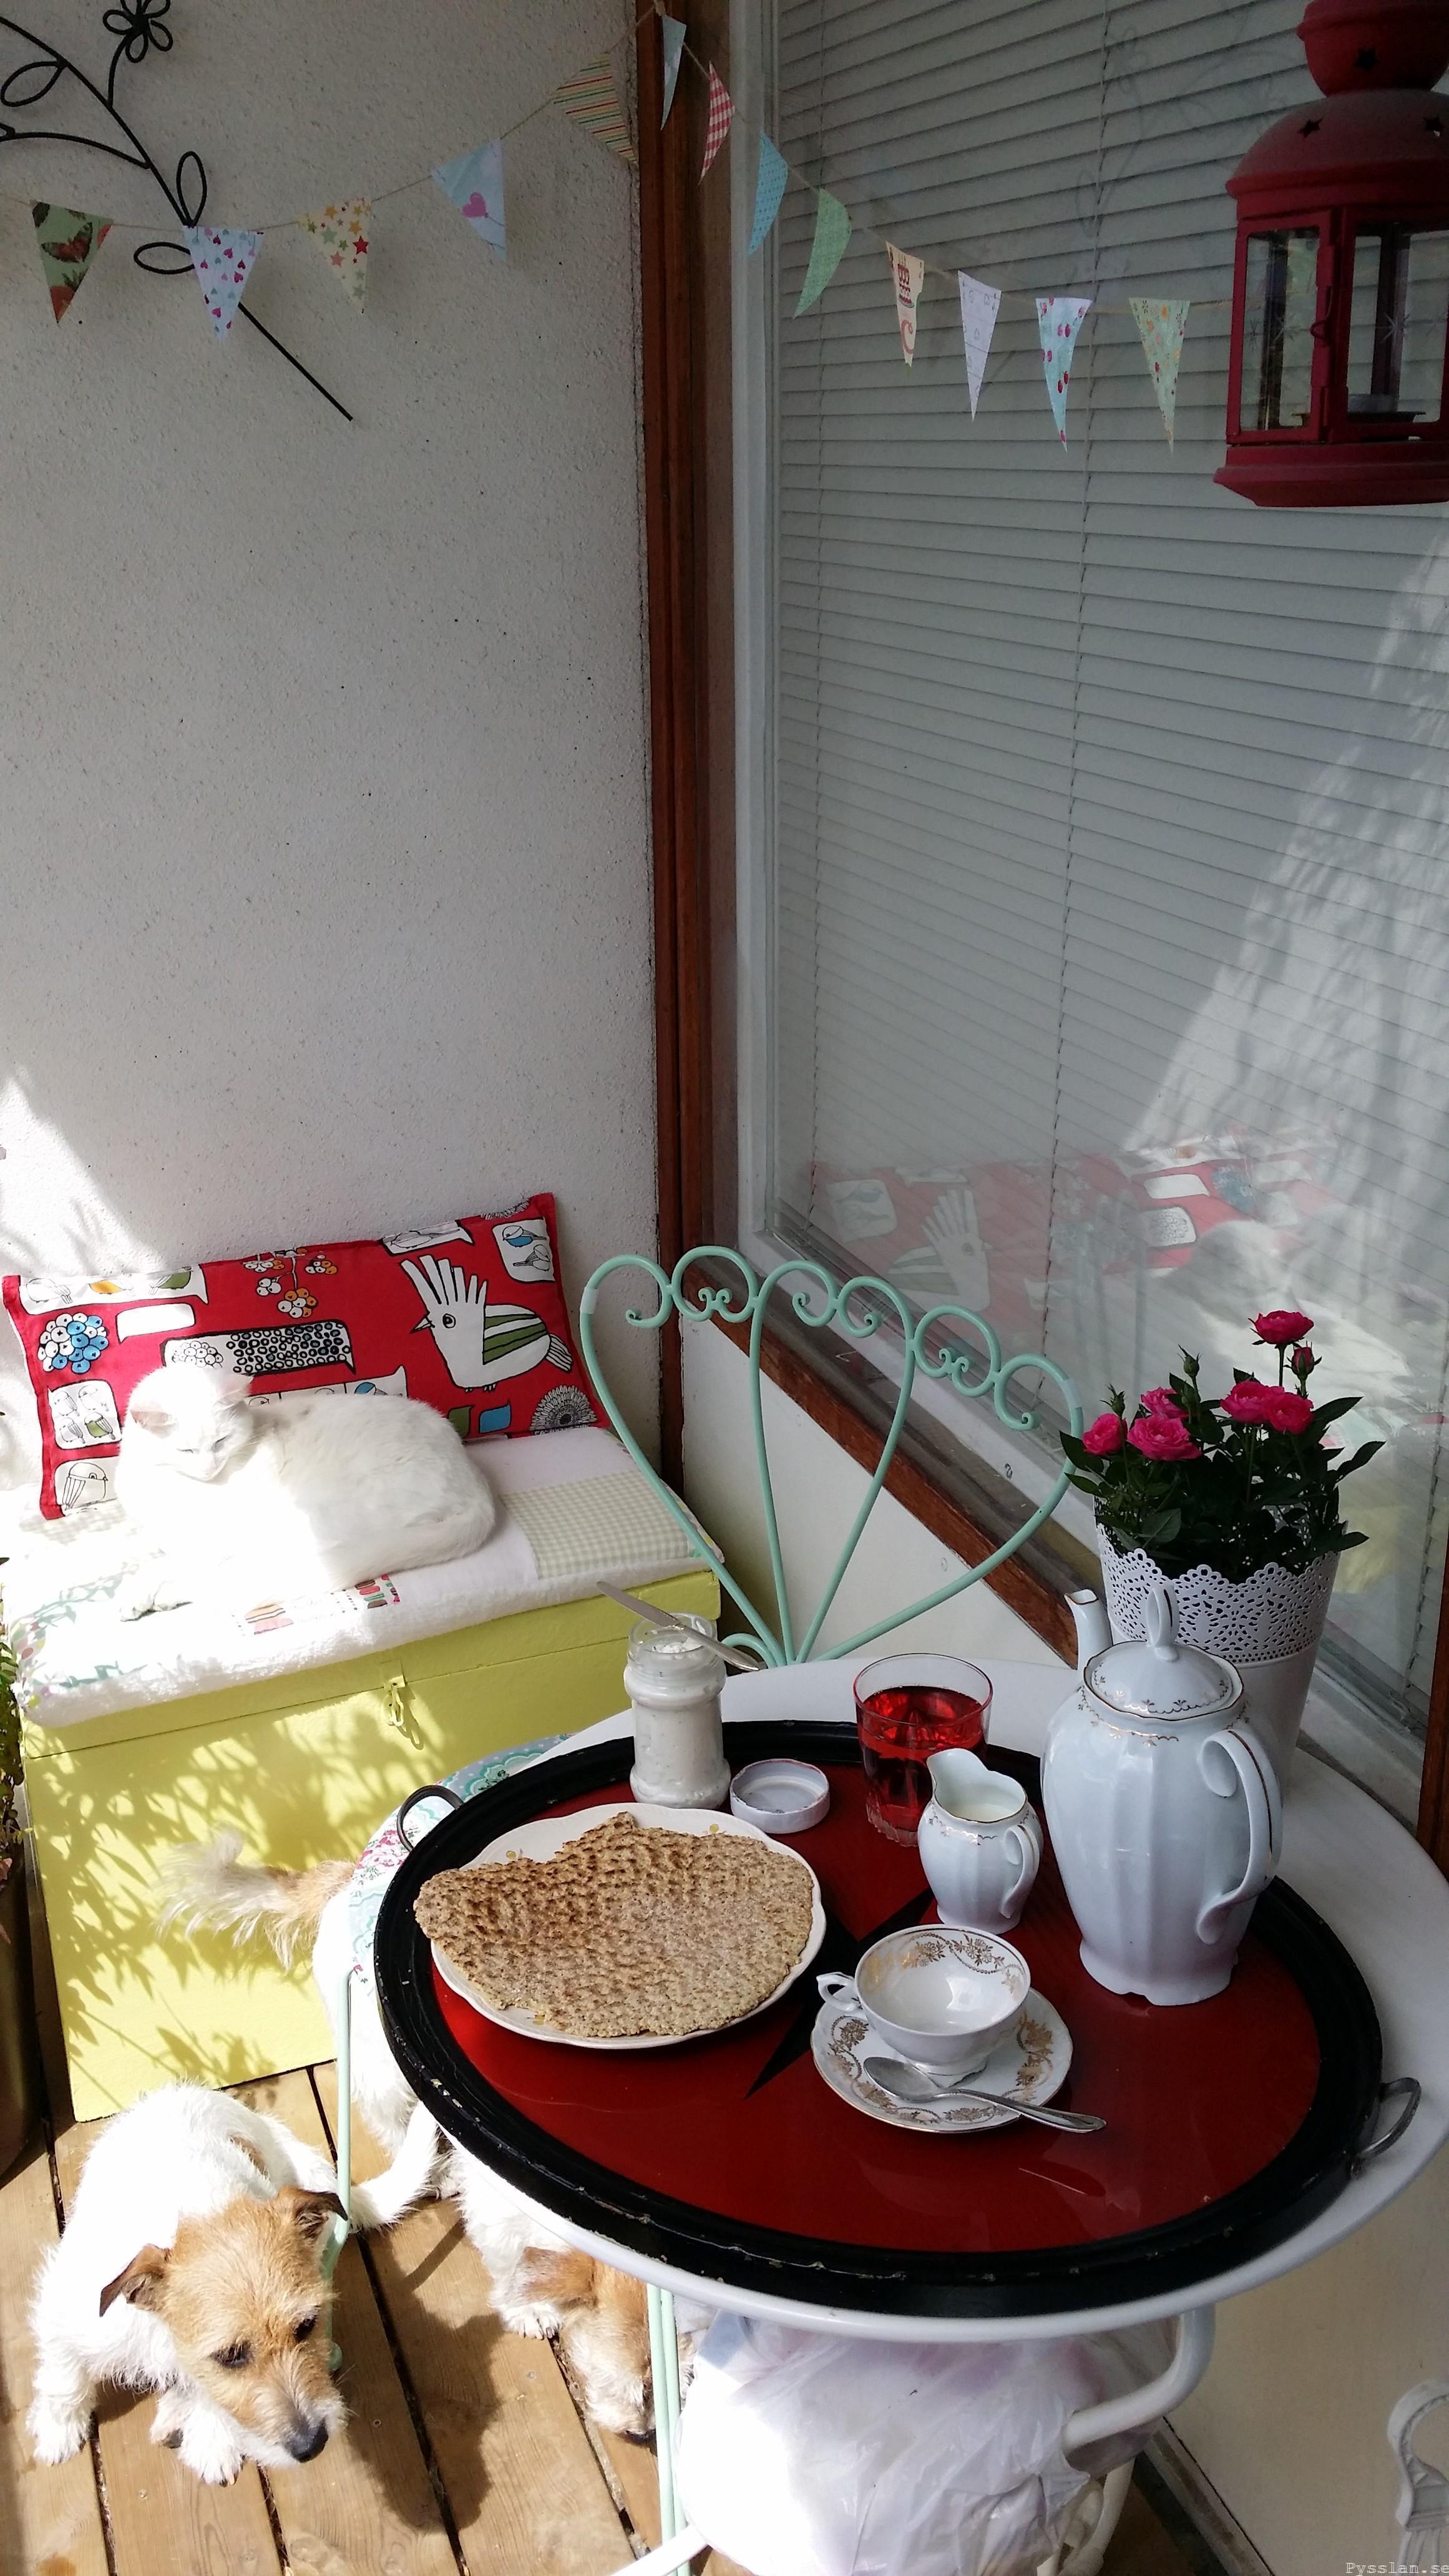 Frukostbröd snabbt enkelt söndagsmorgon lyx Stomp ingefärste hemmagjord mjukost Pysslan blogg